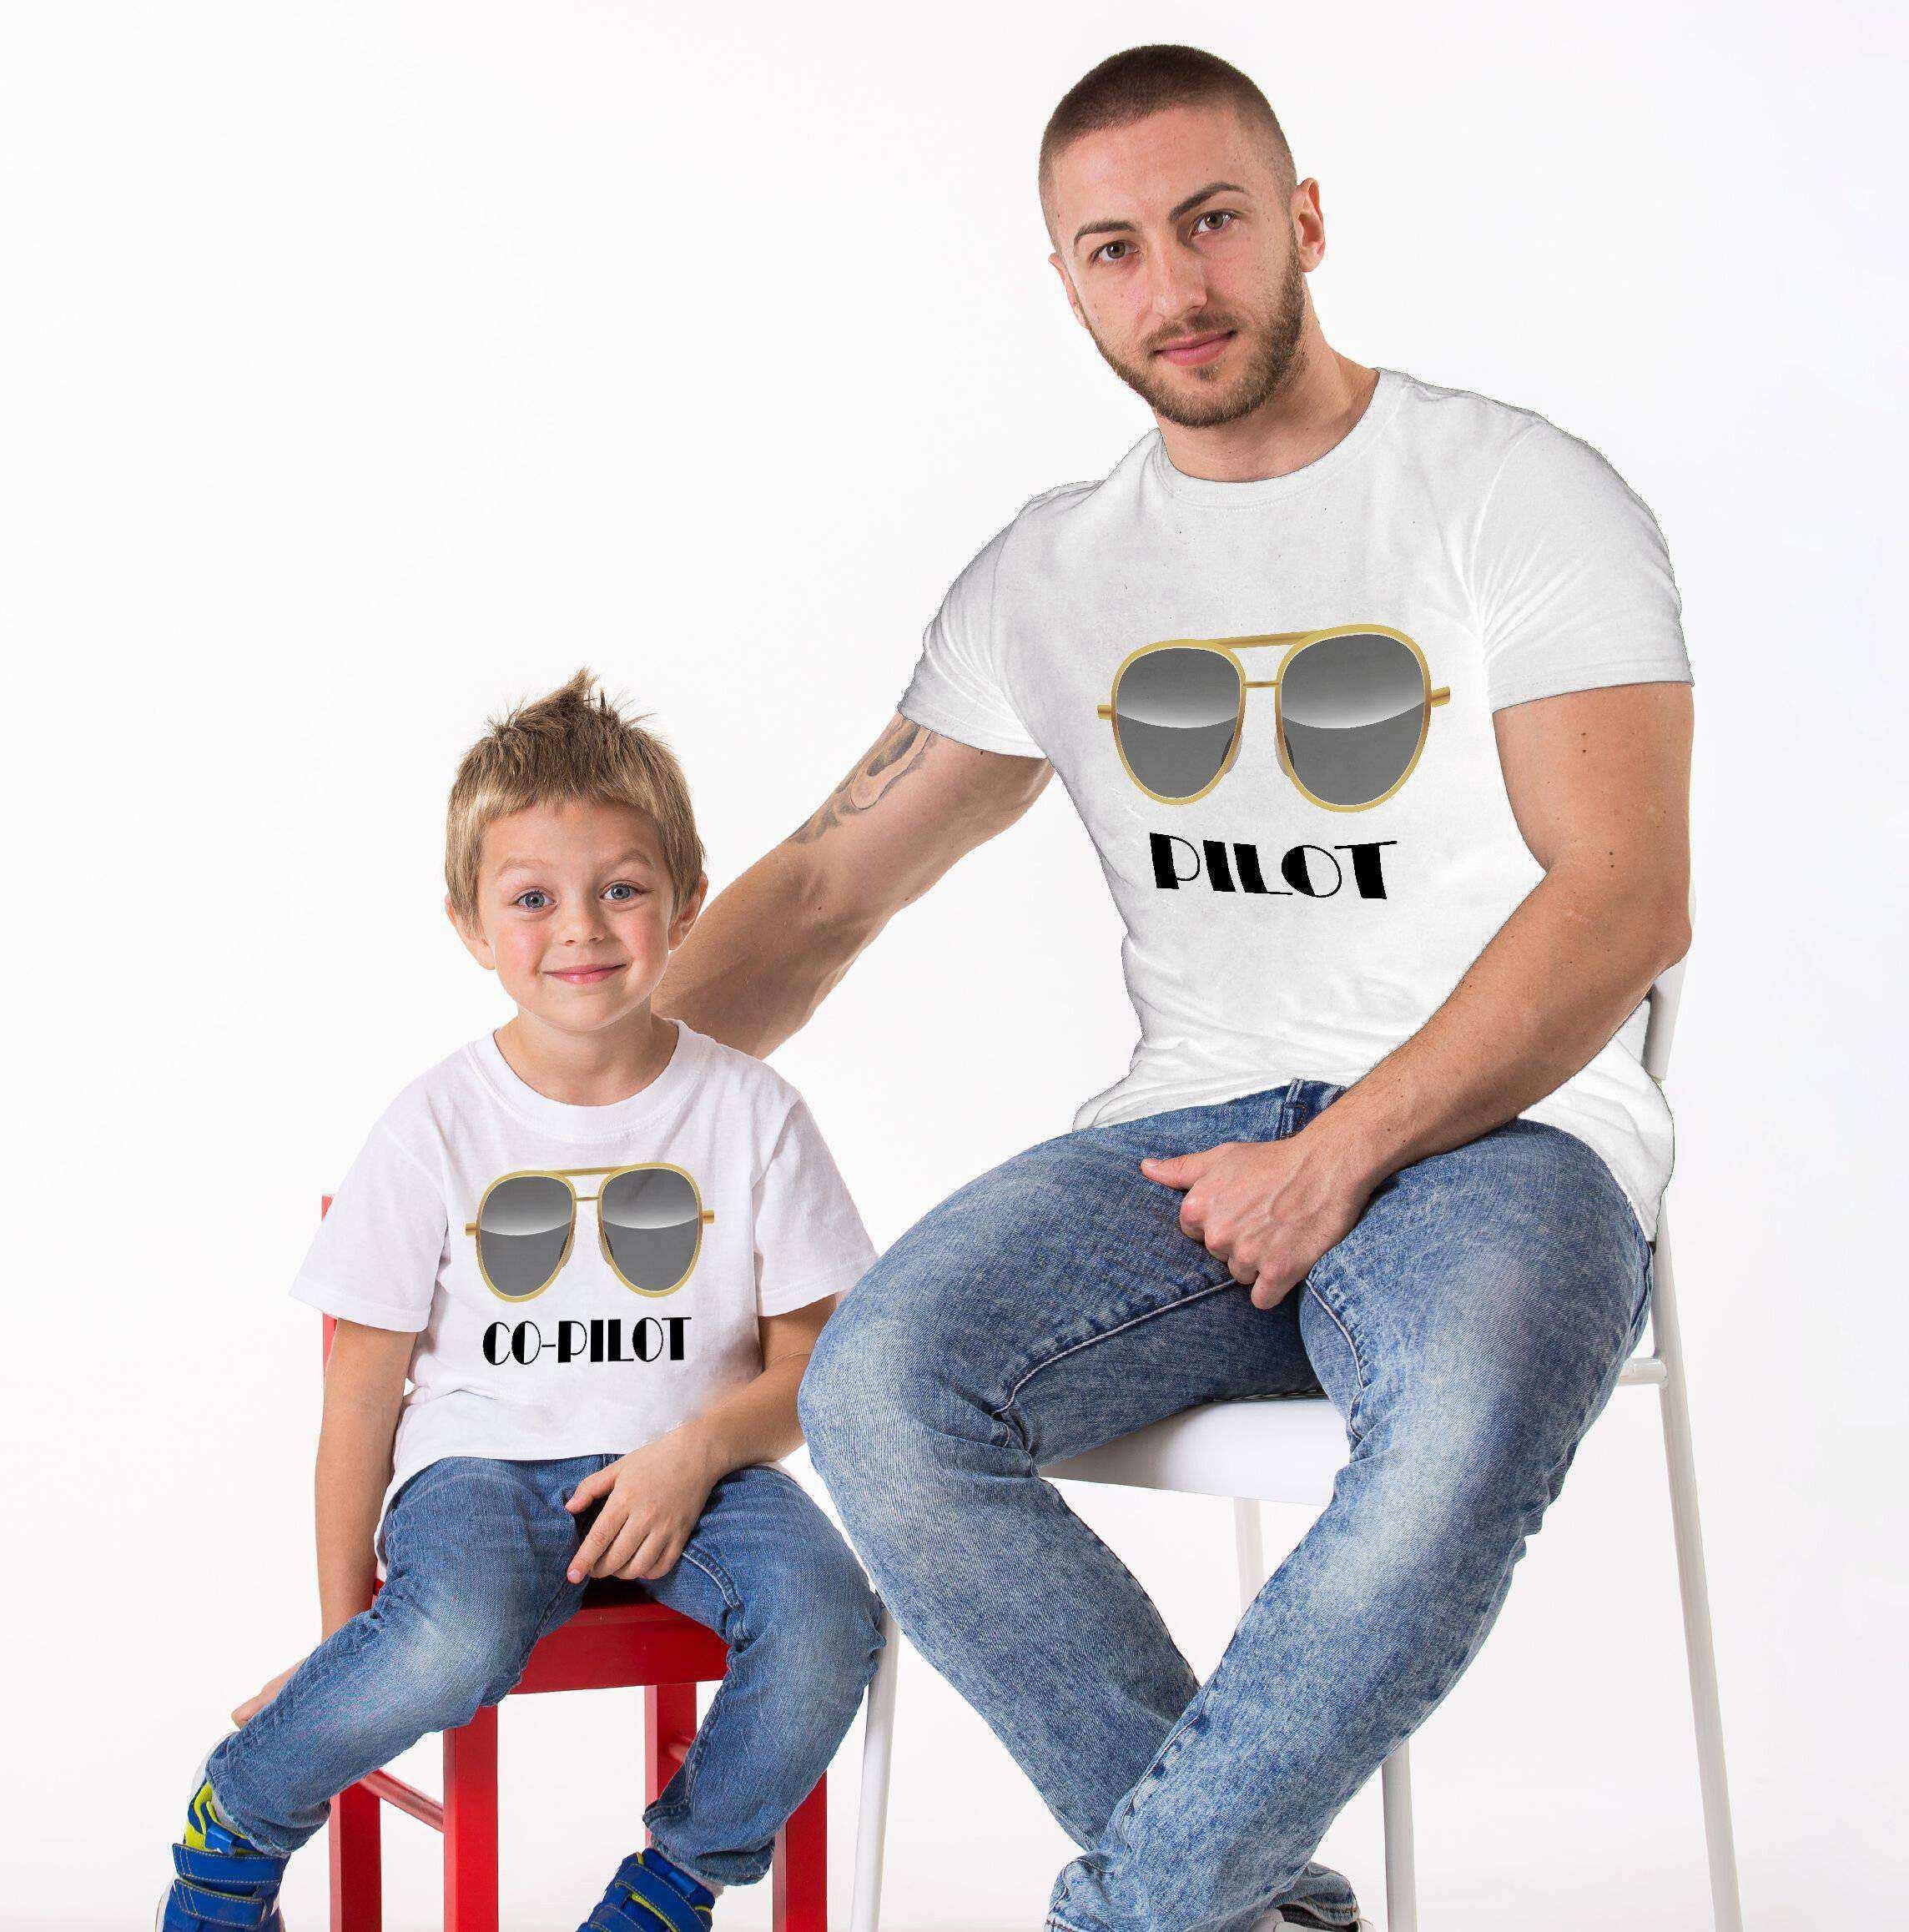 Tshirthane Pilot Co-Pilot Baba Oğul Giyim Beyaz Tshirt Baba Ogul